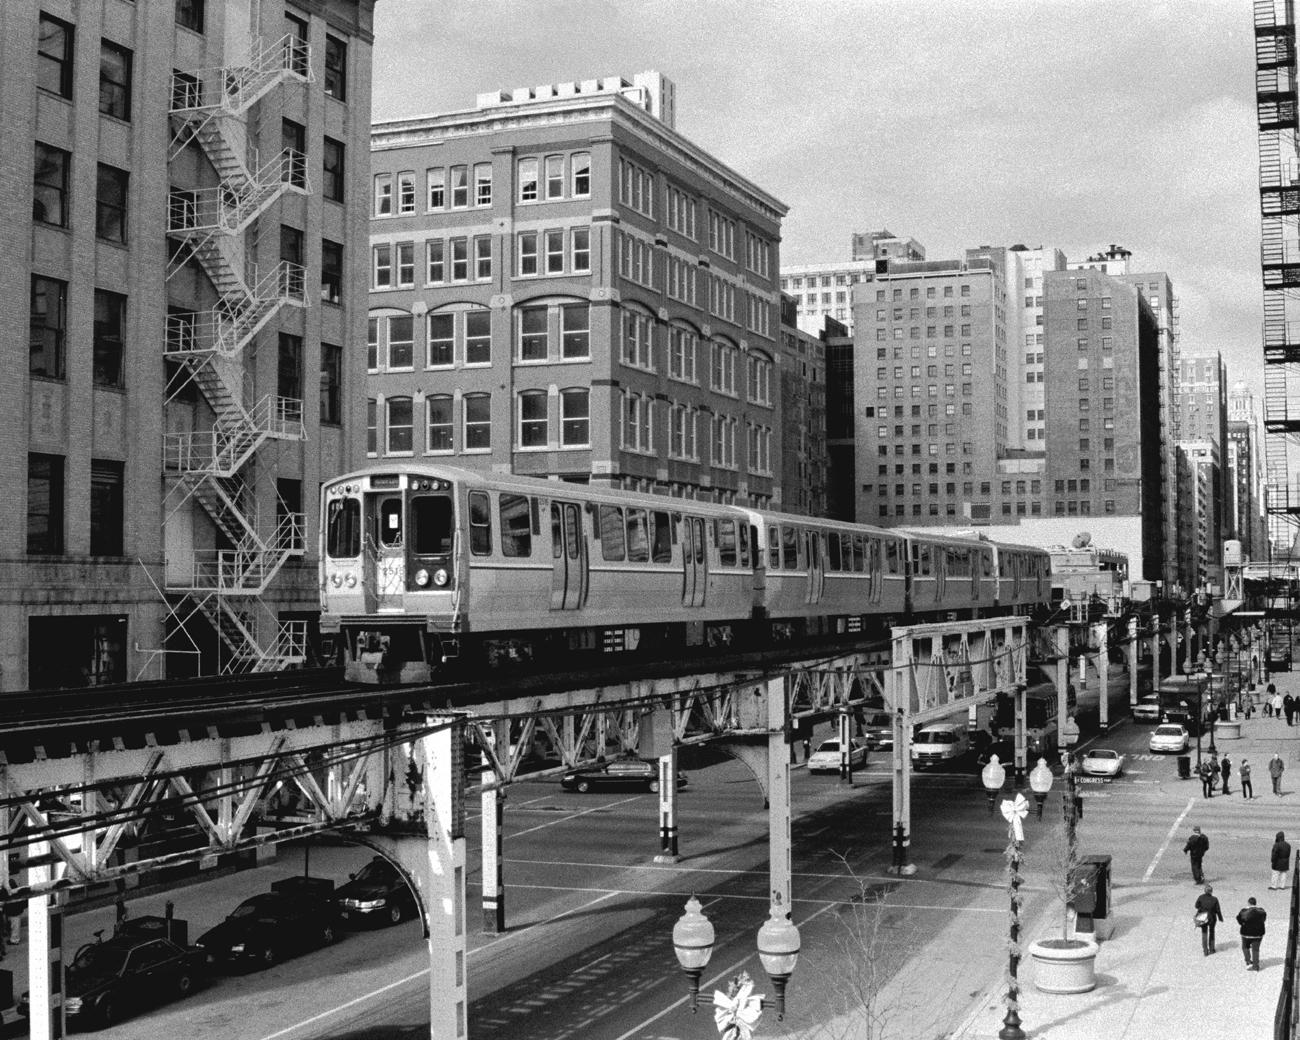 Chicago Black White Wallpaper Cta Train On The Chicago L Tracks